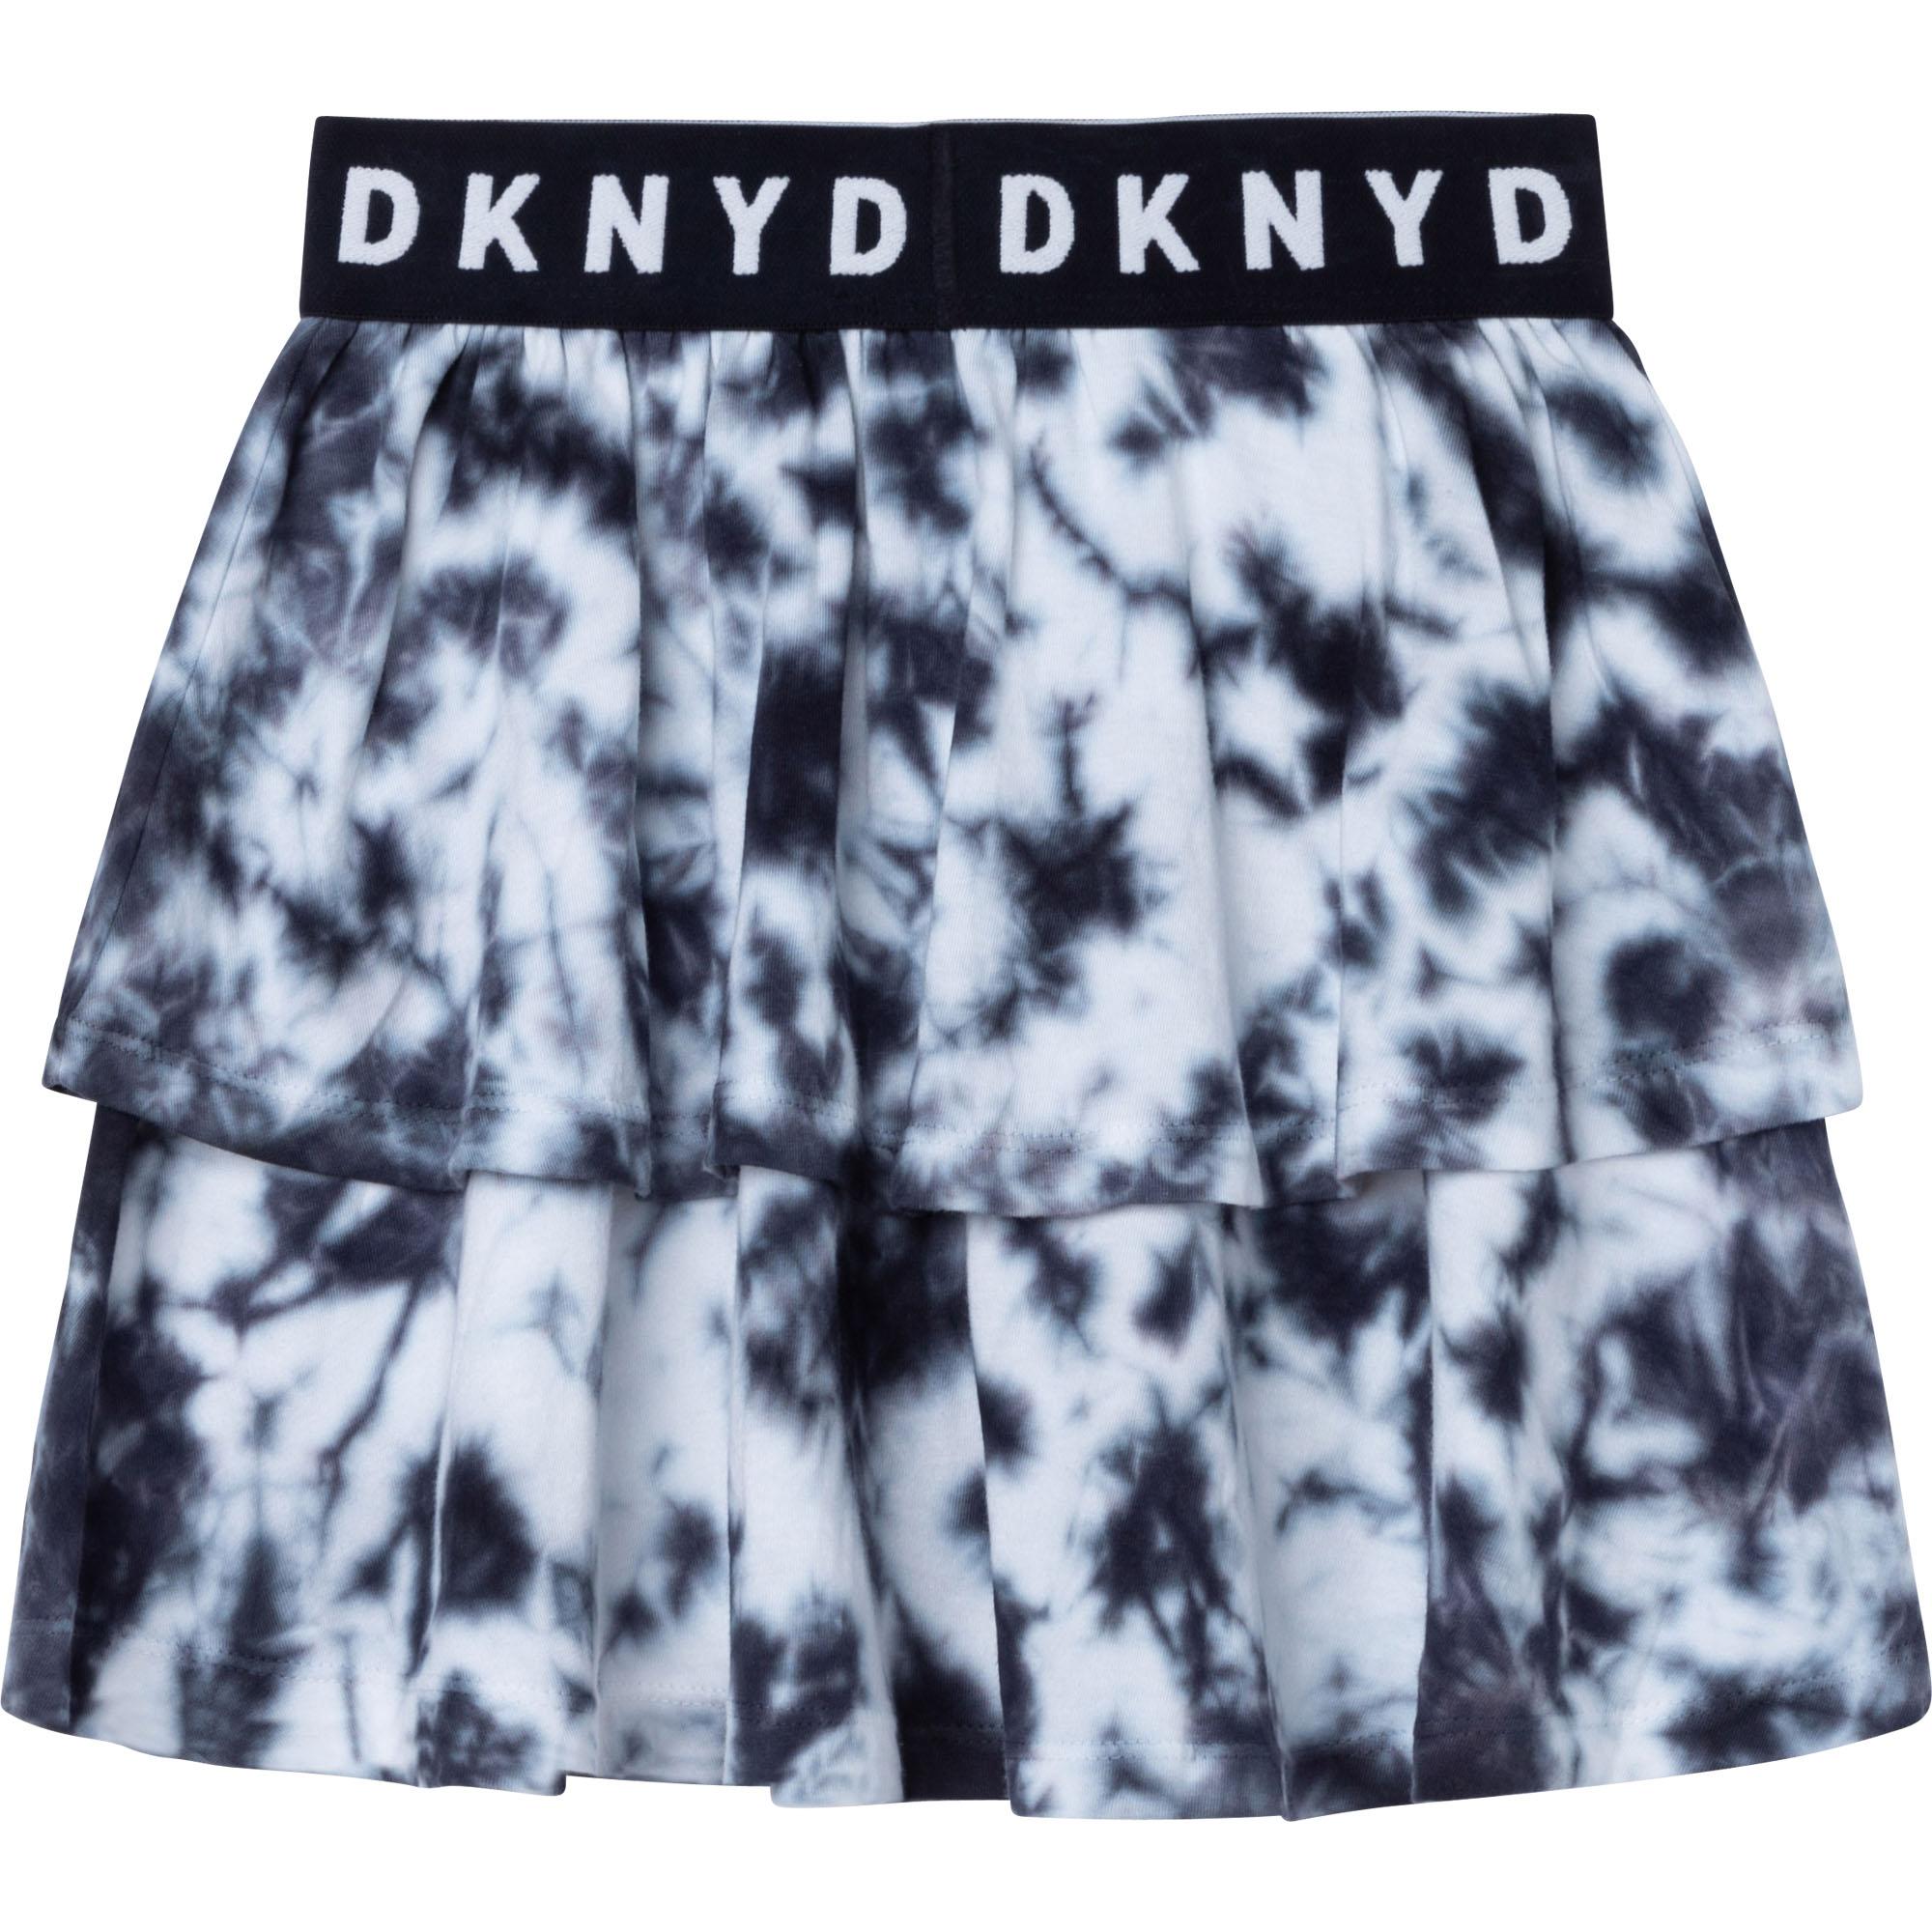 JUPE DKNY pour FILLE